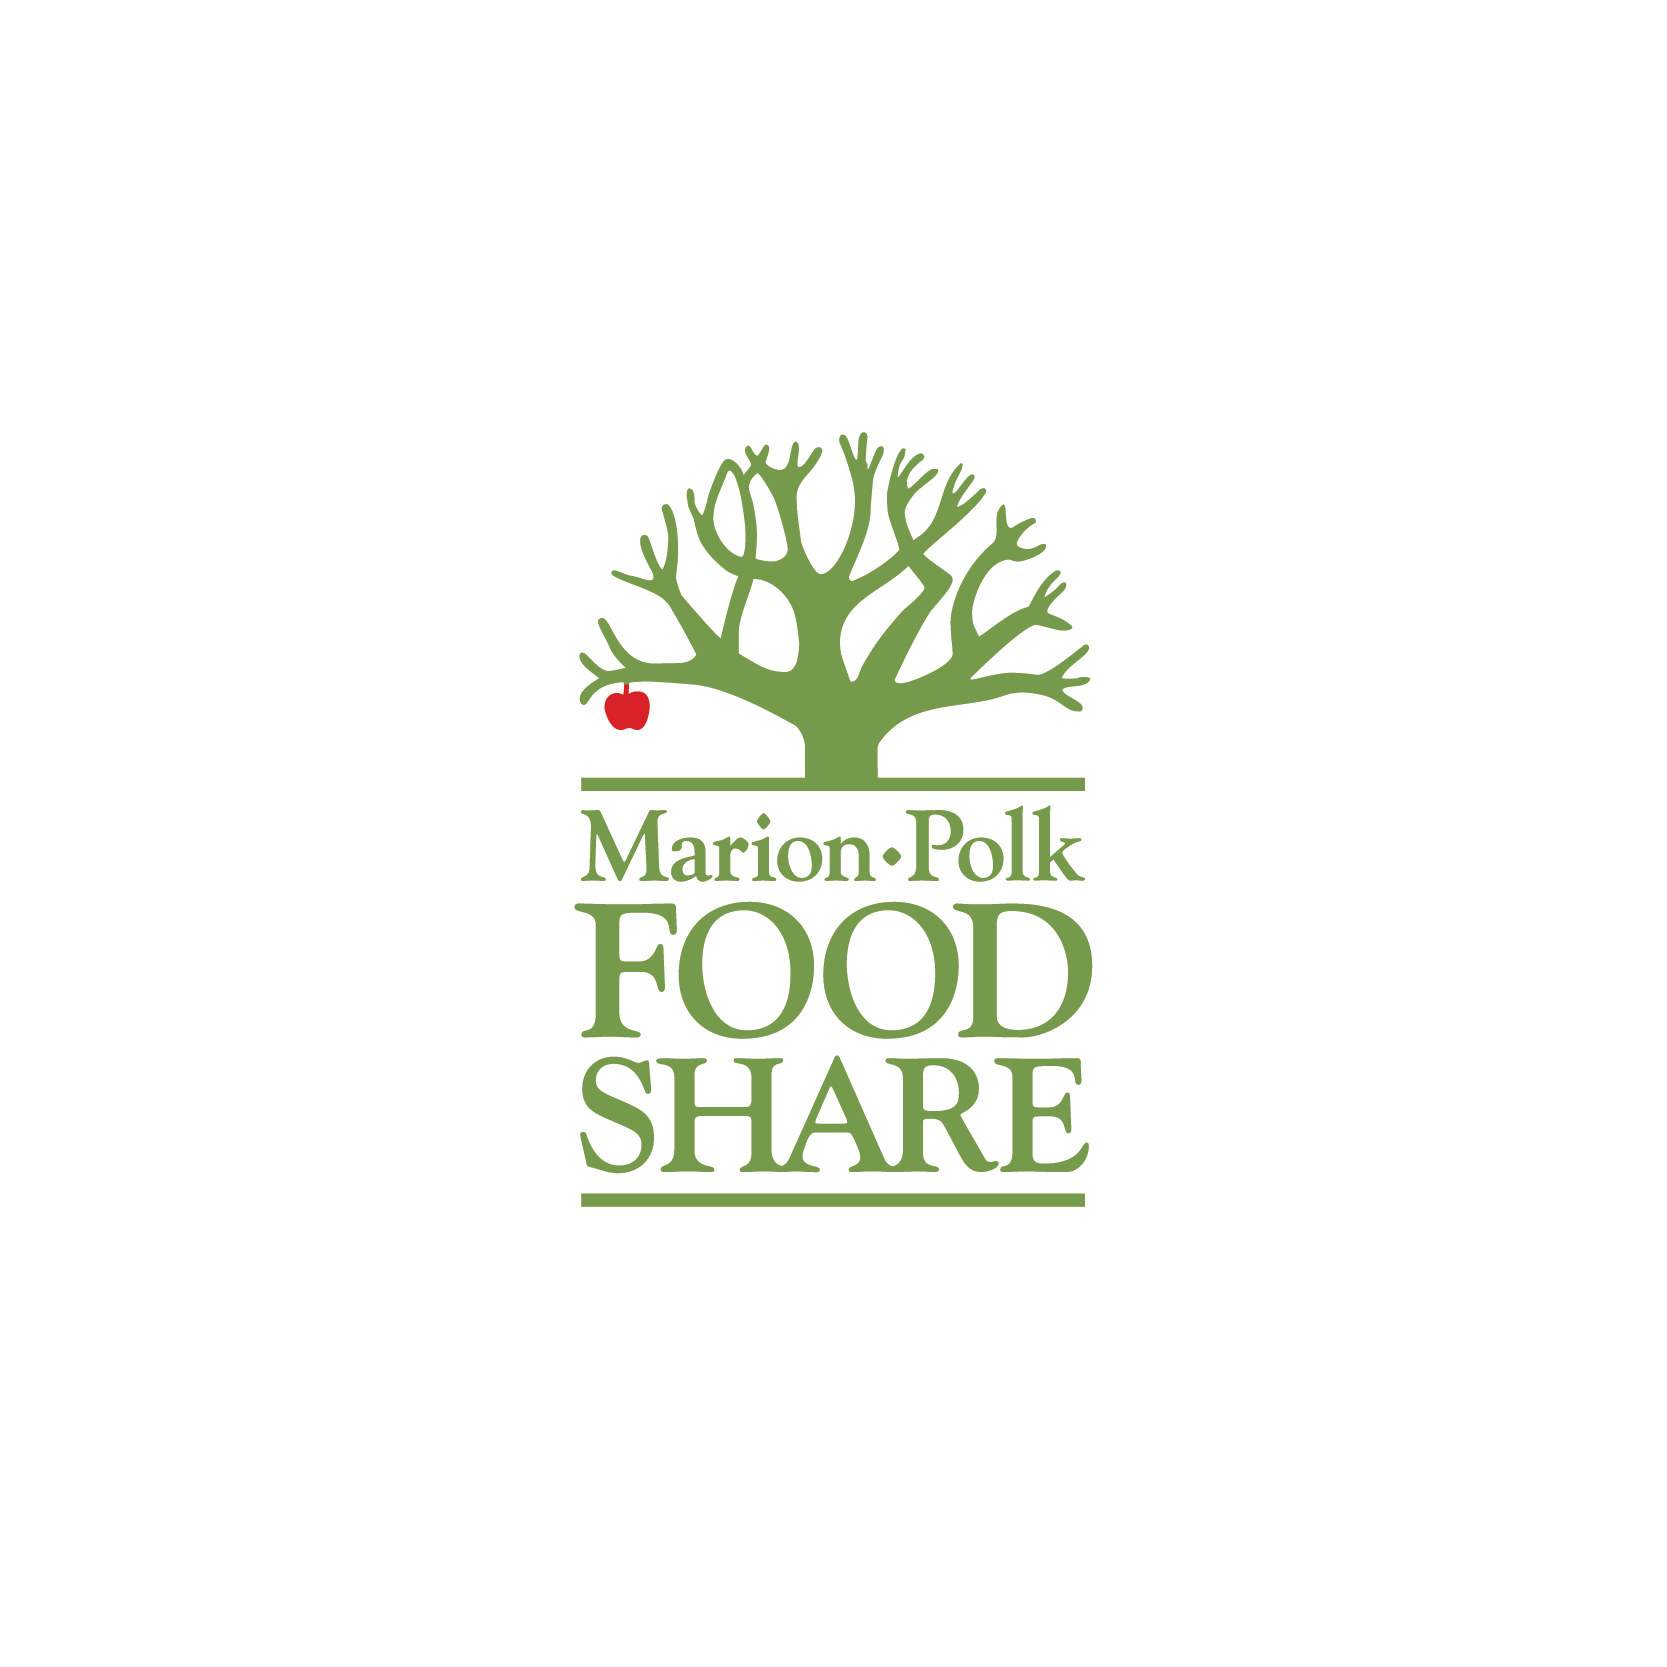 Marion-Polk-Food-Share-logo.jpg